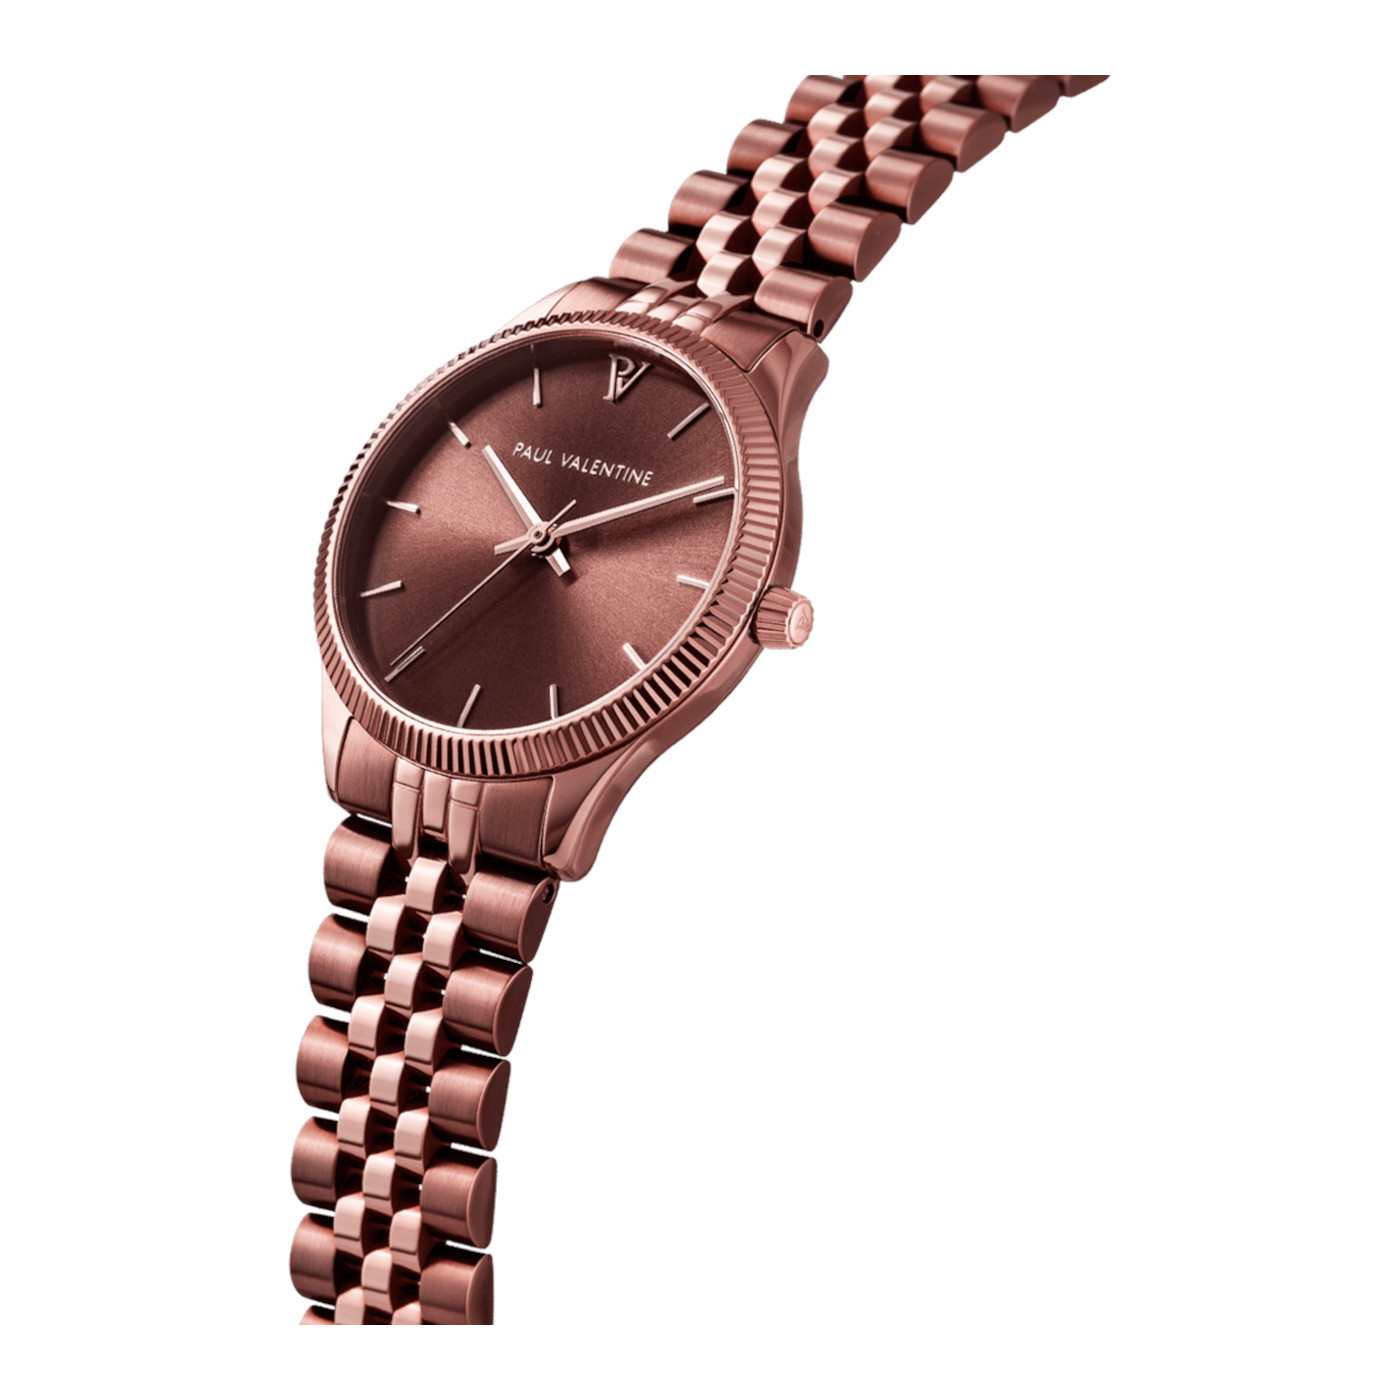 Paul Valentine Iconia 36 mm horloge PVW1018-0000052